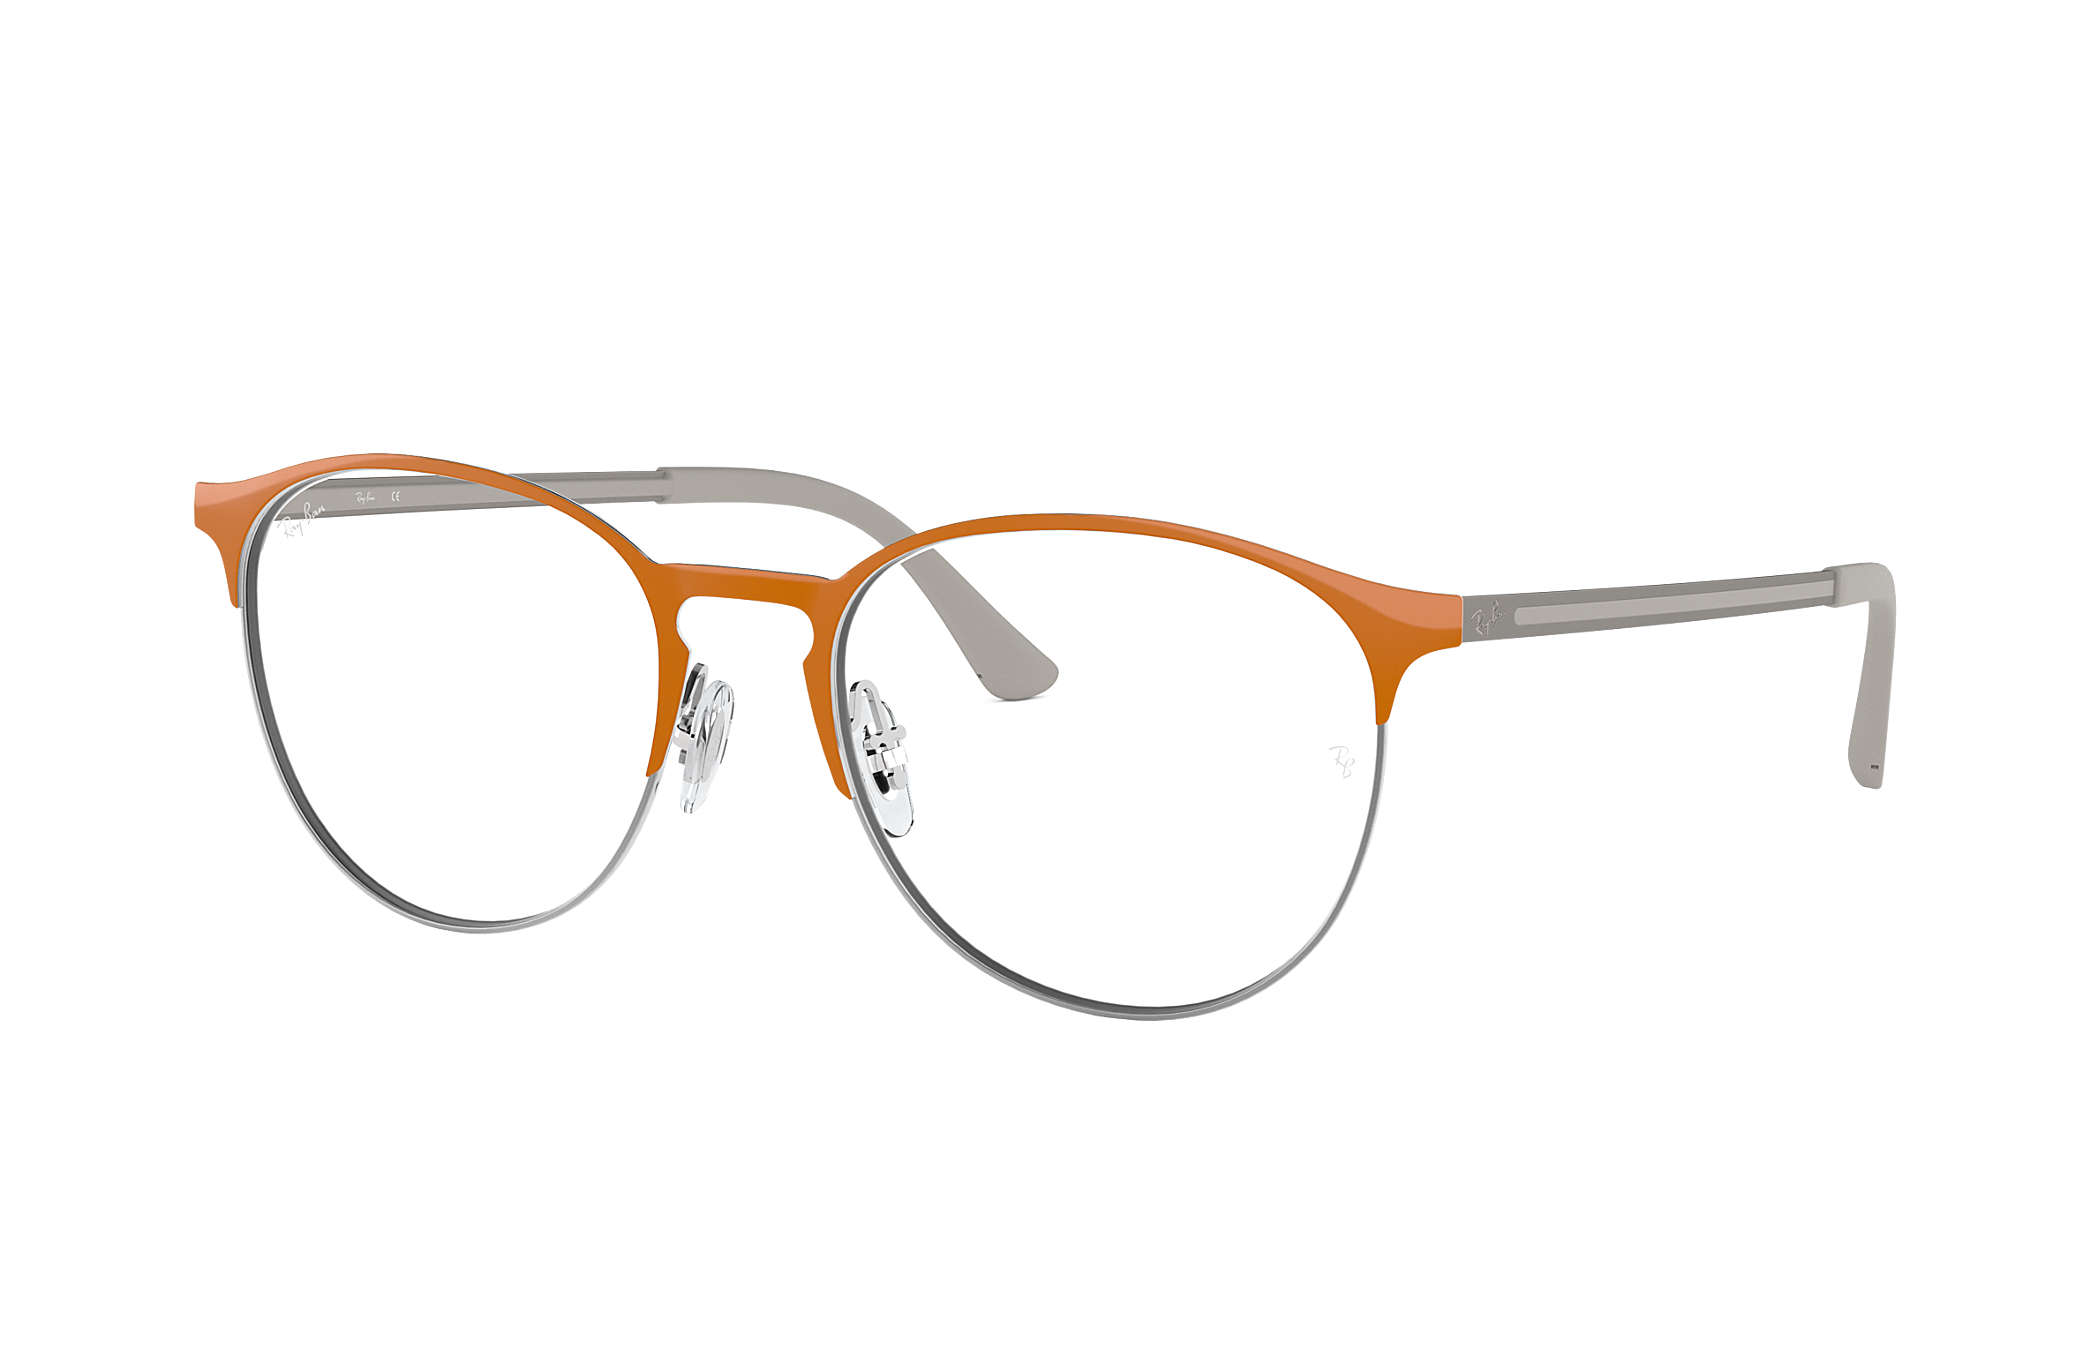 6548551299bf0 Óculos de grau Ray-Ban RB6375 Preto - Metal - 0RX6375294453   Ray ...